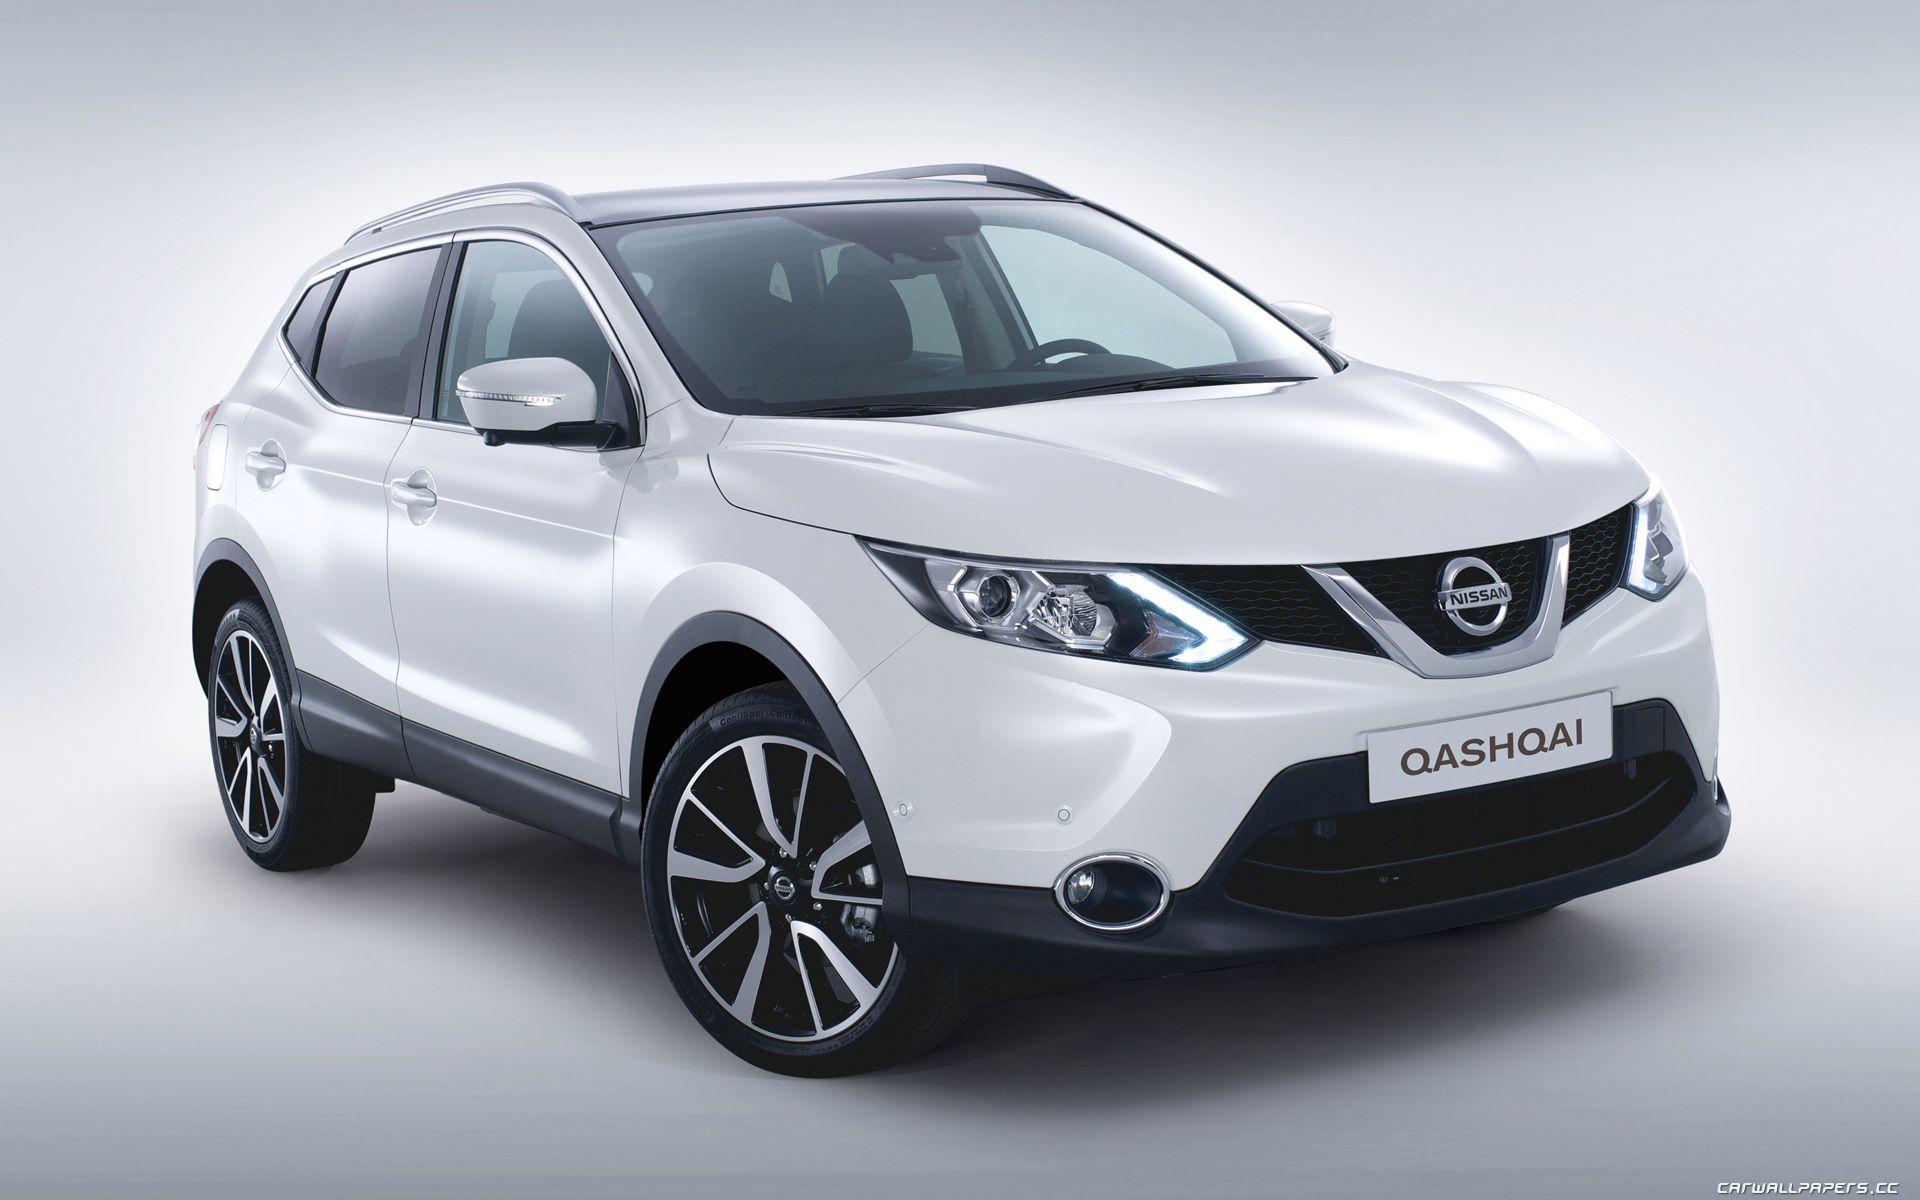 2016 Model Nissan Qashqai